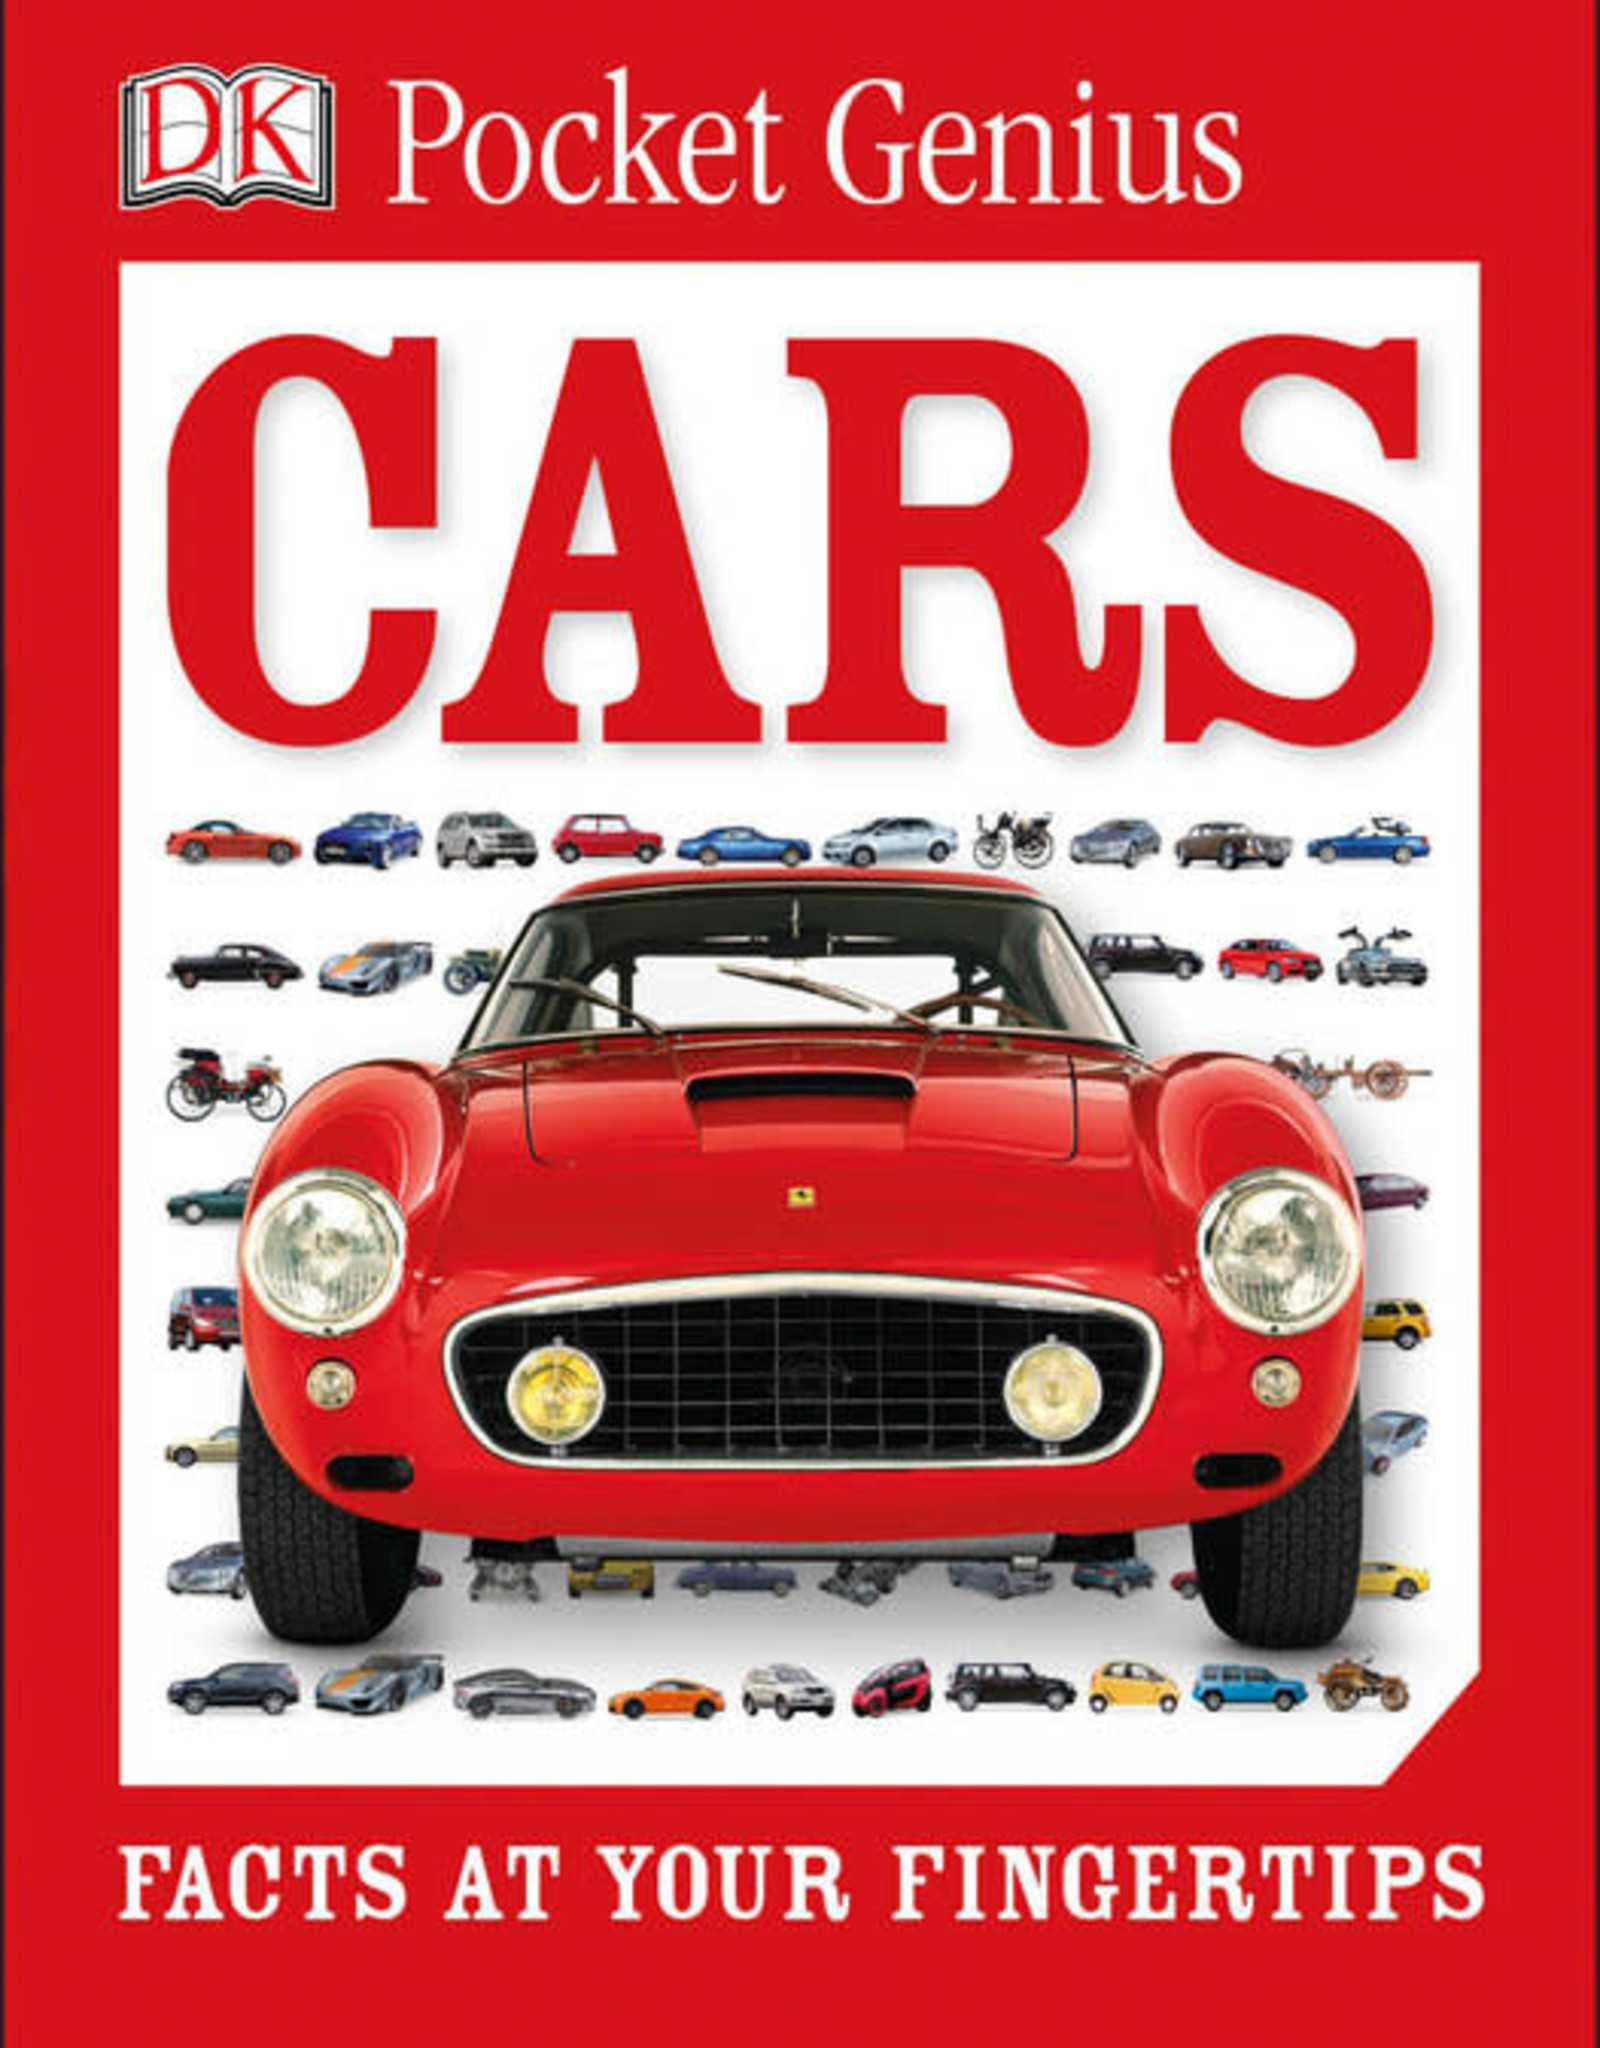 DK Pocket Genius Cars